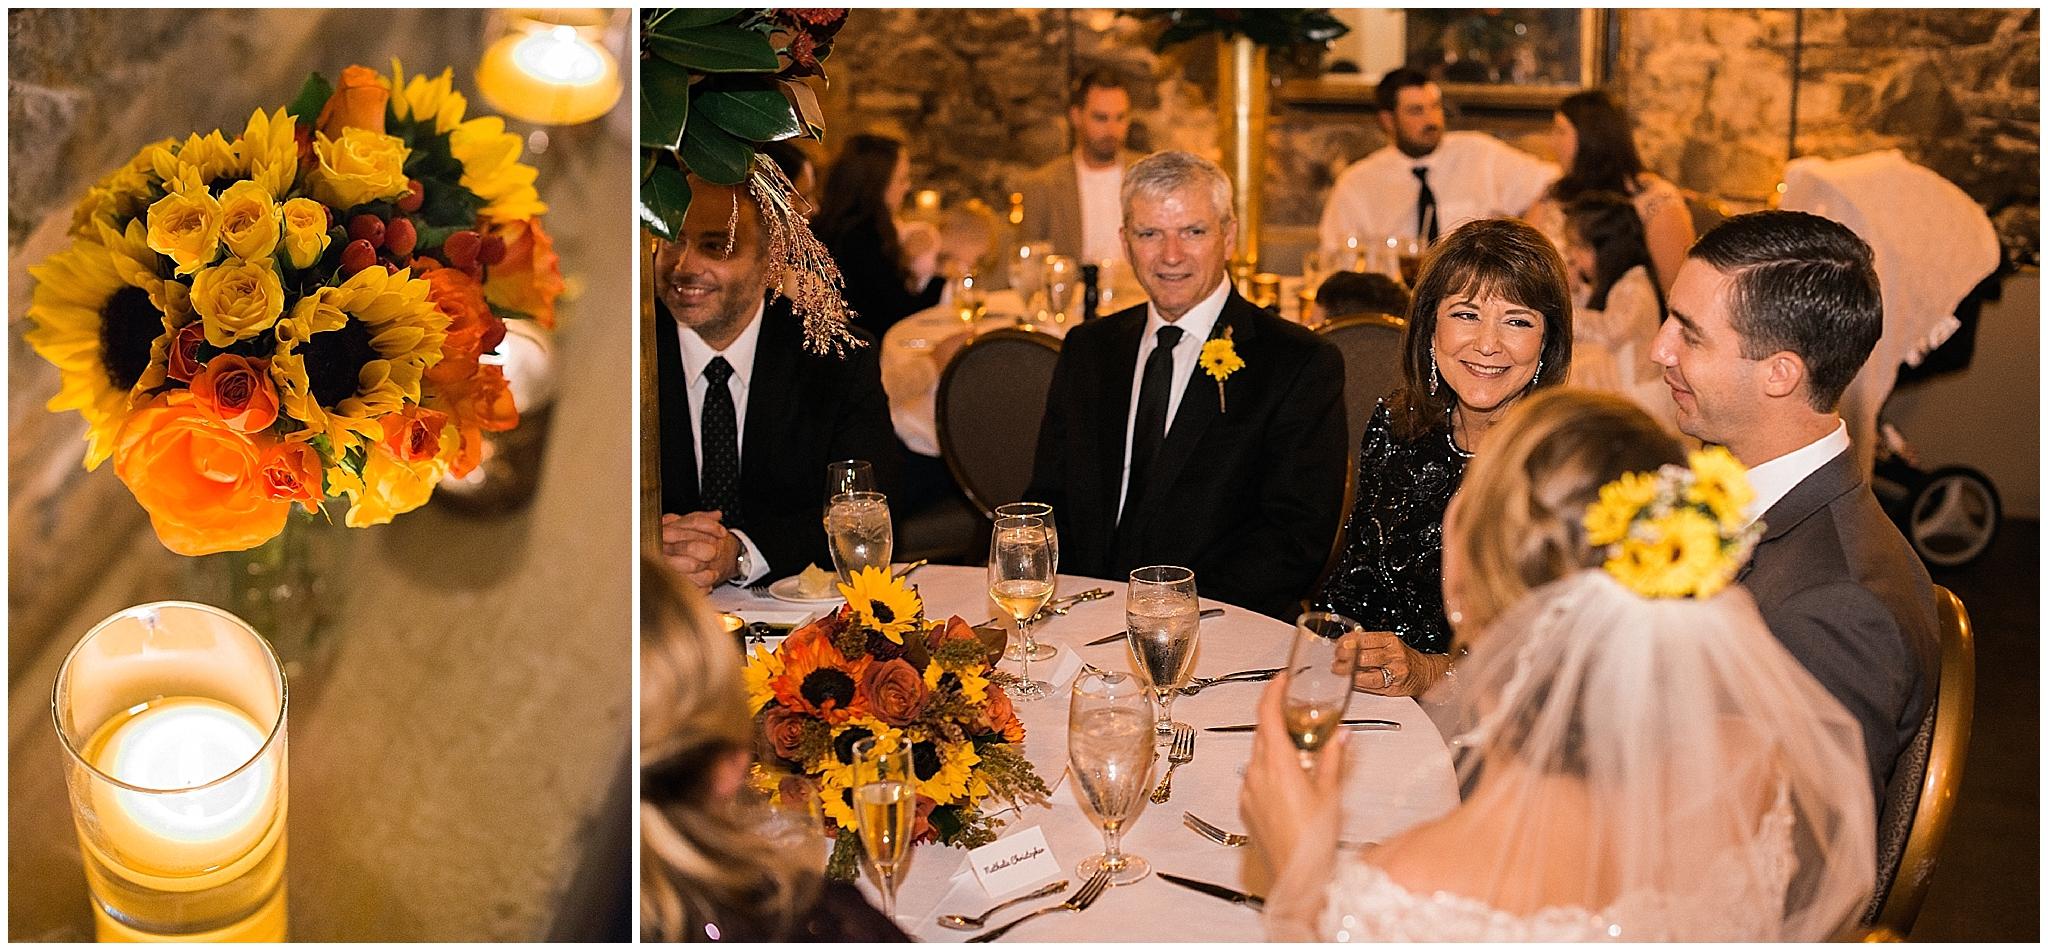 Biltmore_Wedding_Reception_Wine_Cellar_Asheville_Photographer-7.jpg